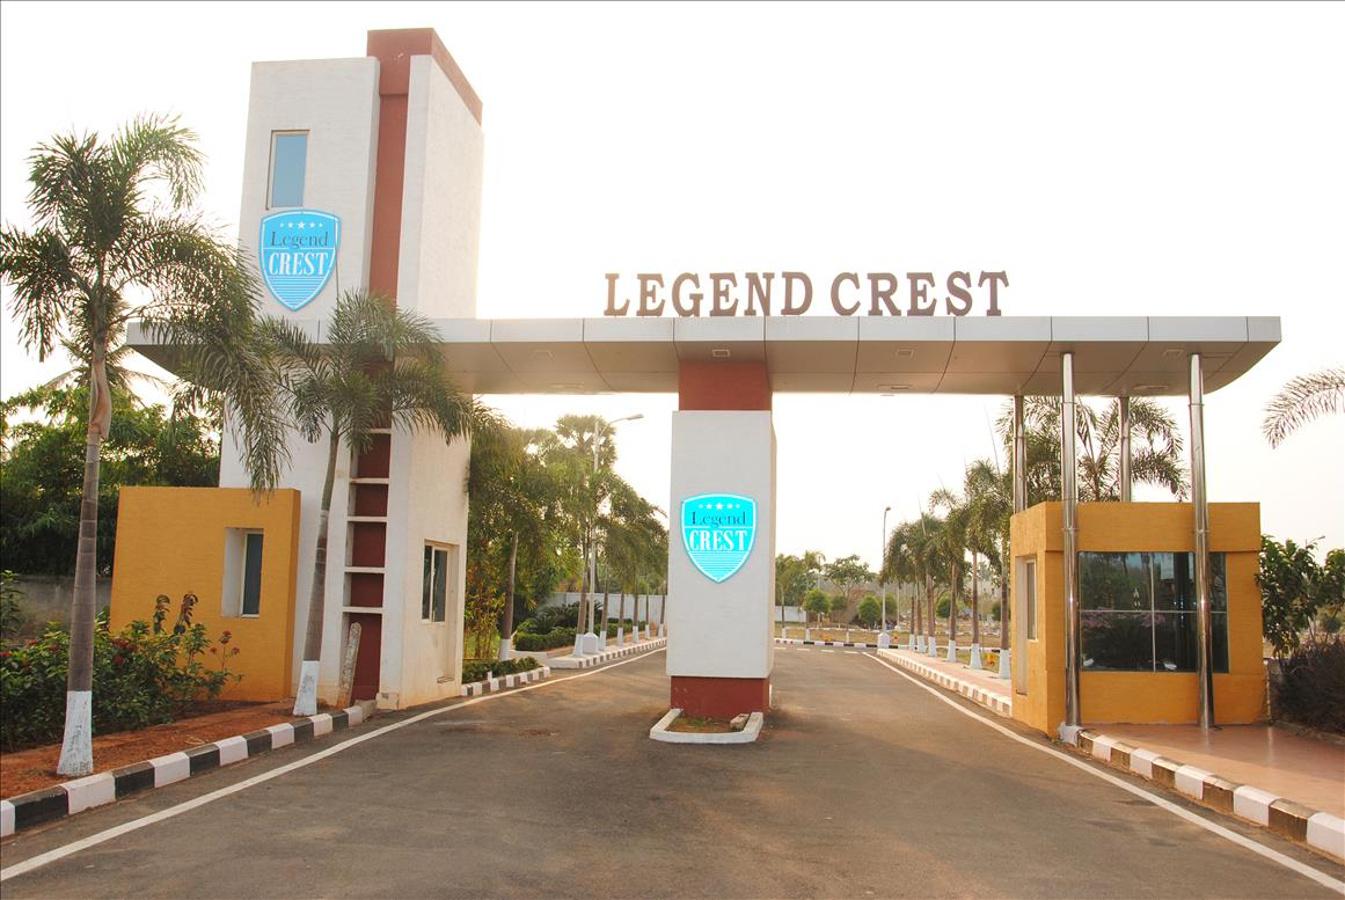 Legend Crest in Tallavalasa, Visakhapatnam - Price, Location